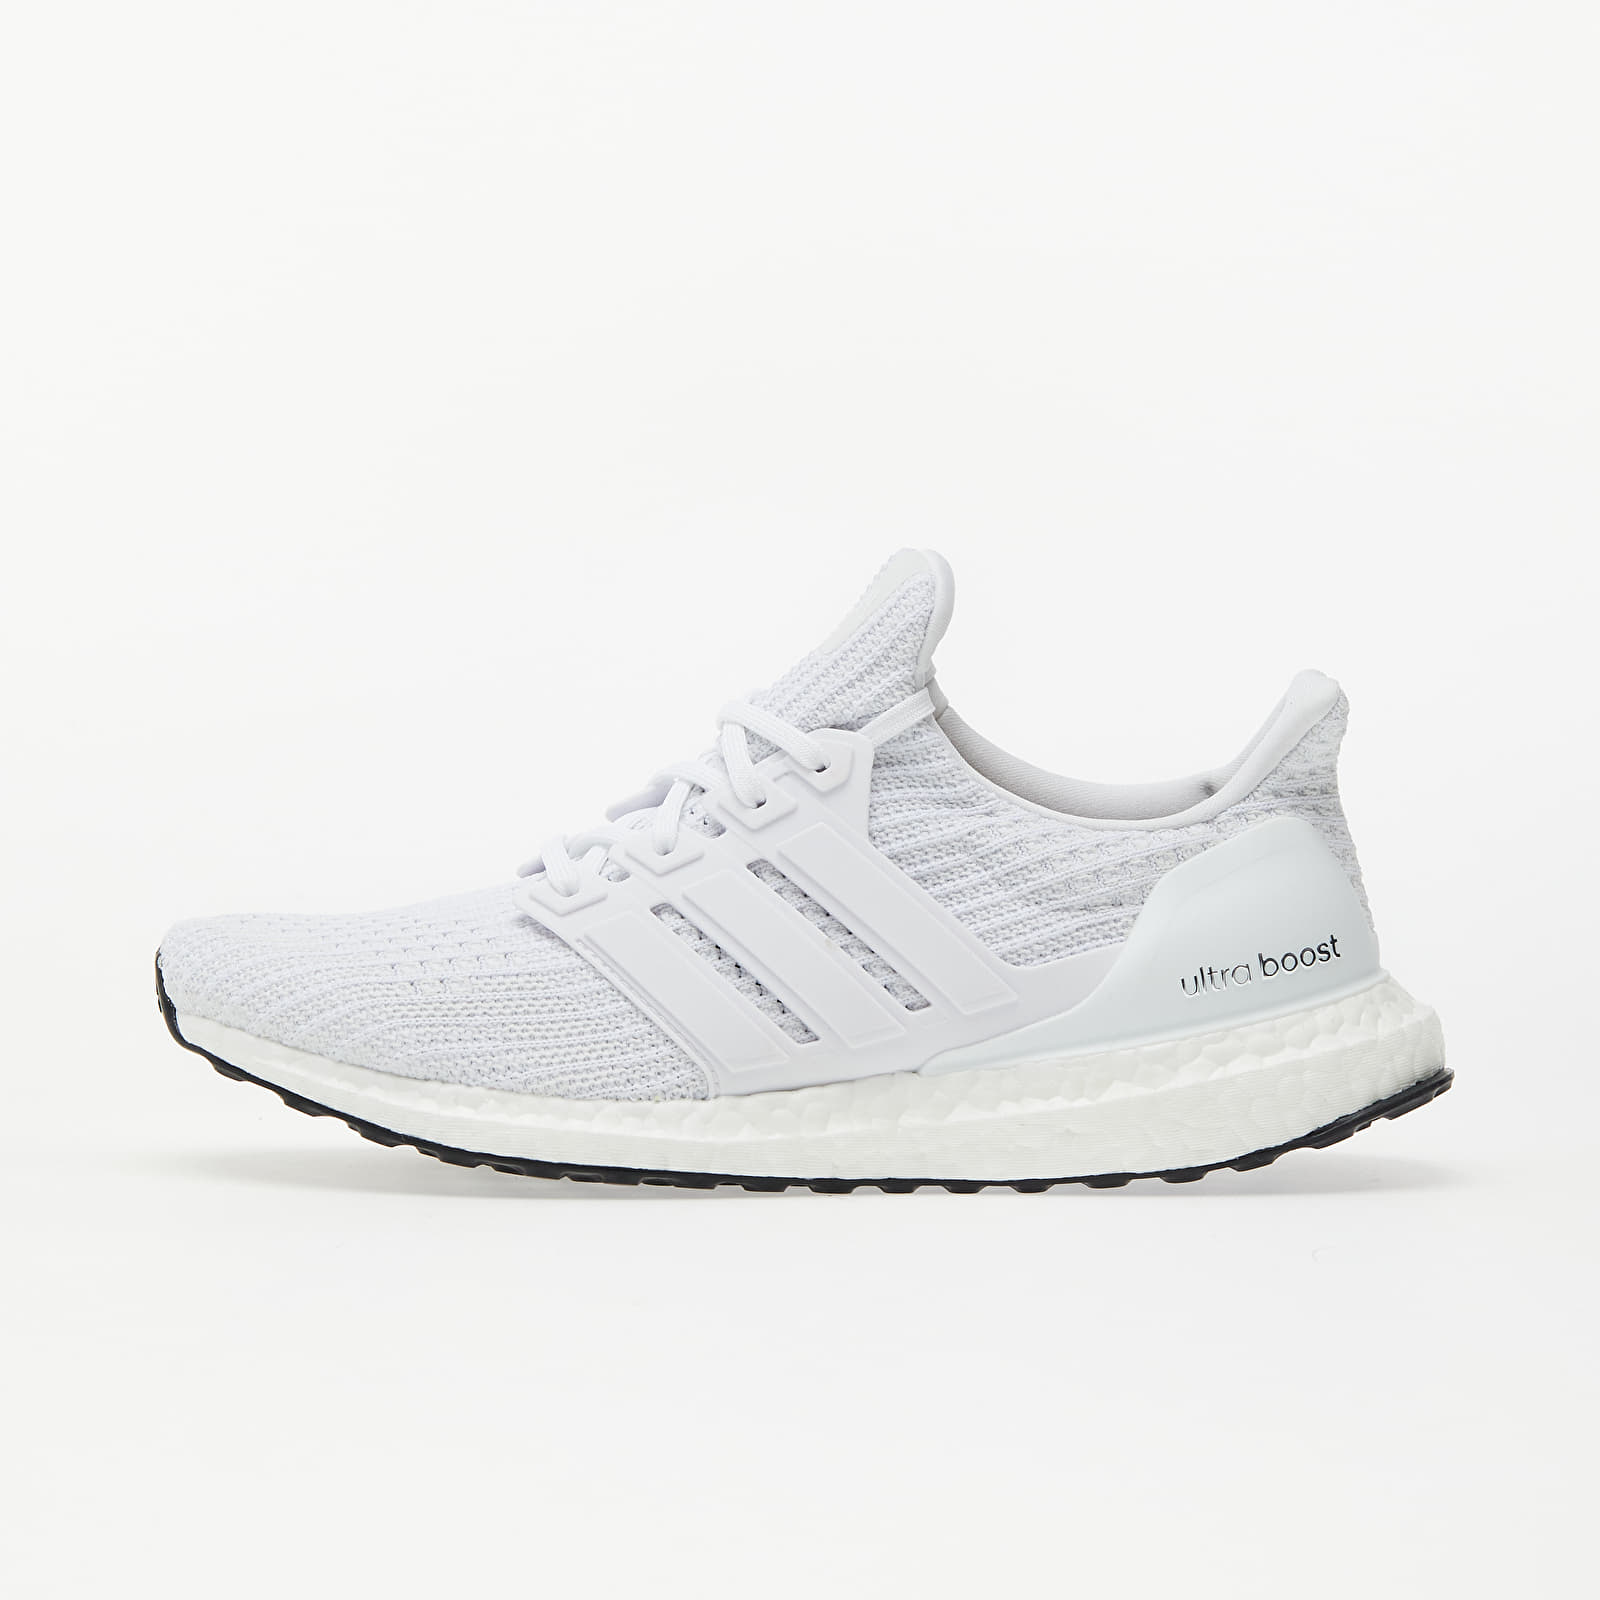 Dámské tenisky a boty adidas Ultraboost W Ftw White/ Ftw White/ Ftw White